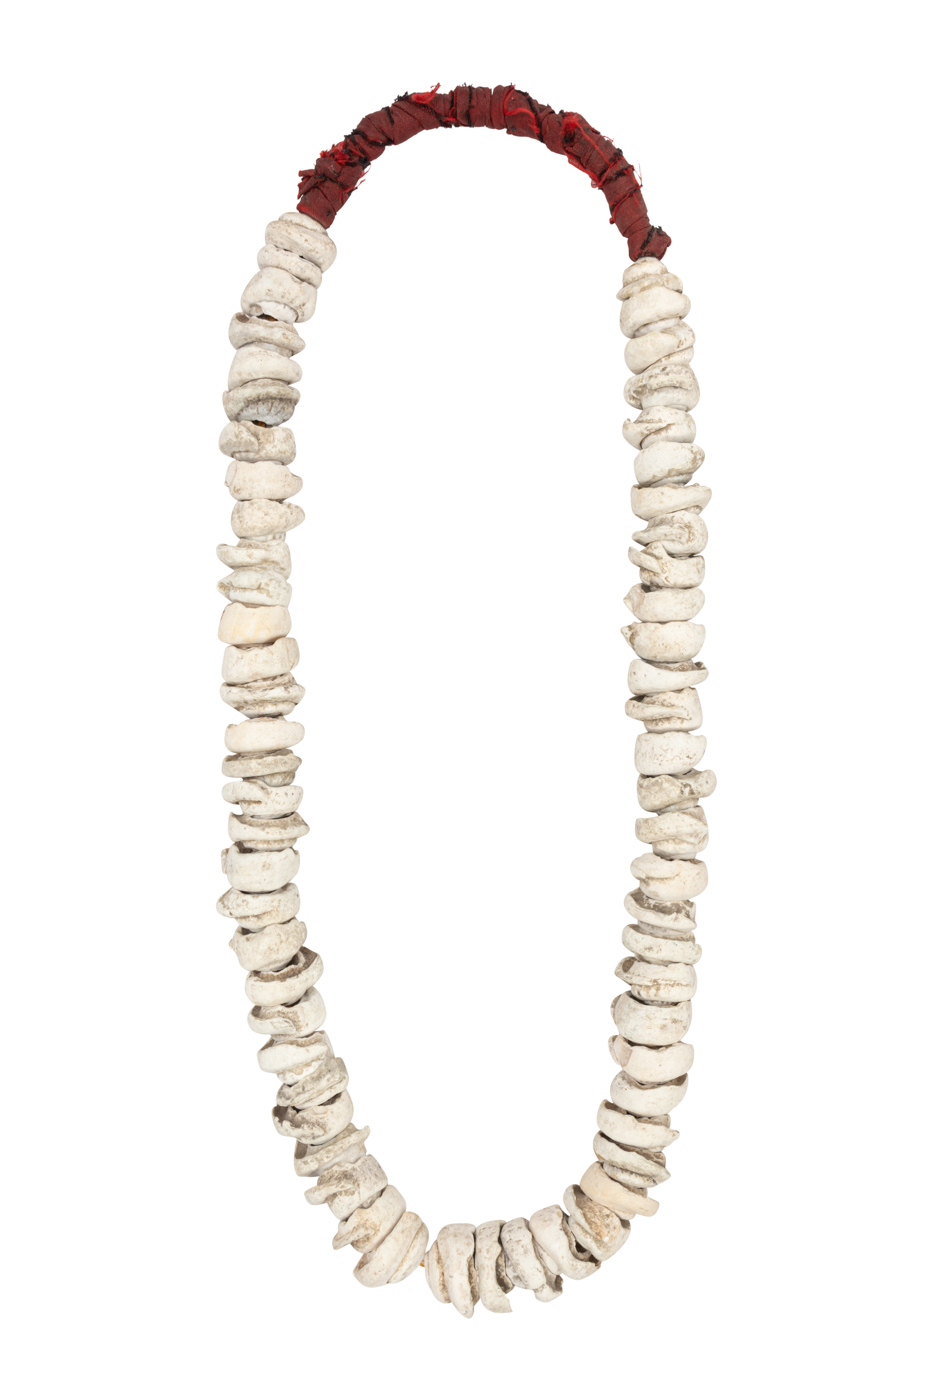 Collar ceremonial Egipcio de huesos